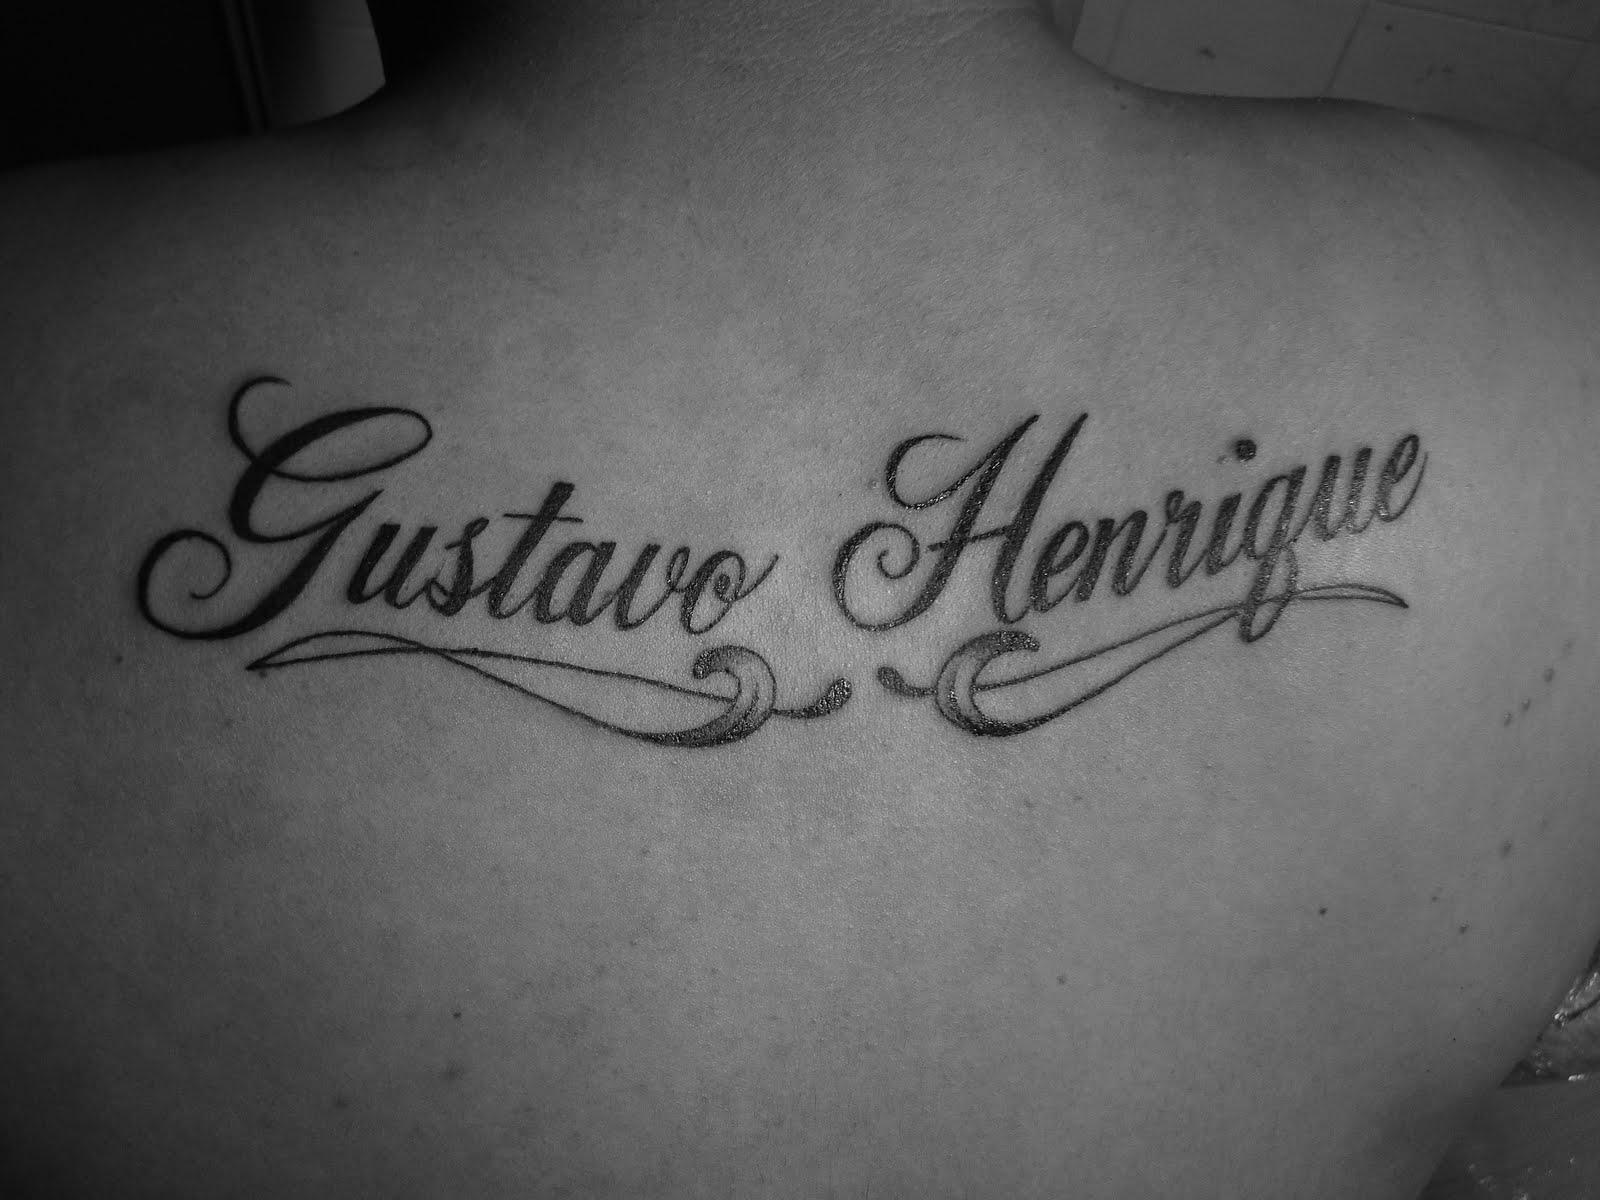 Jb jefferson bastos tatuagem nome por jefferson bastos gustavo henrique altavistaventures Gallery